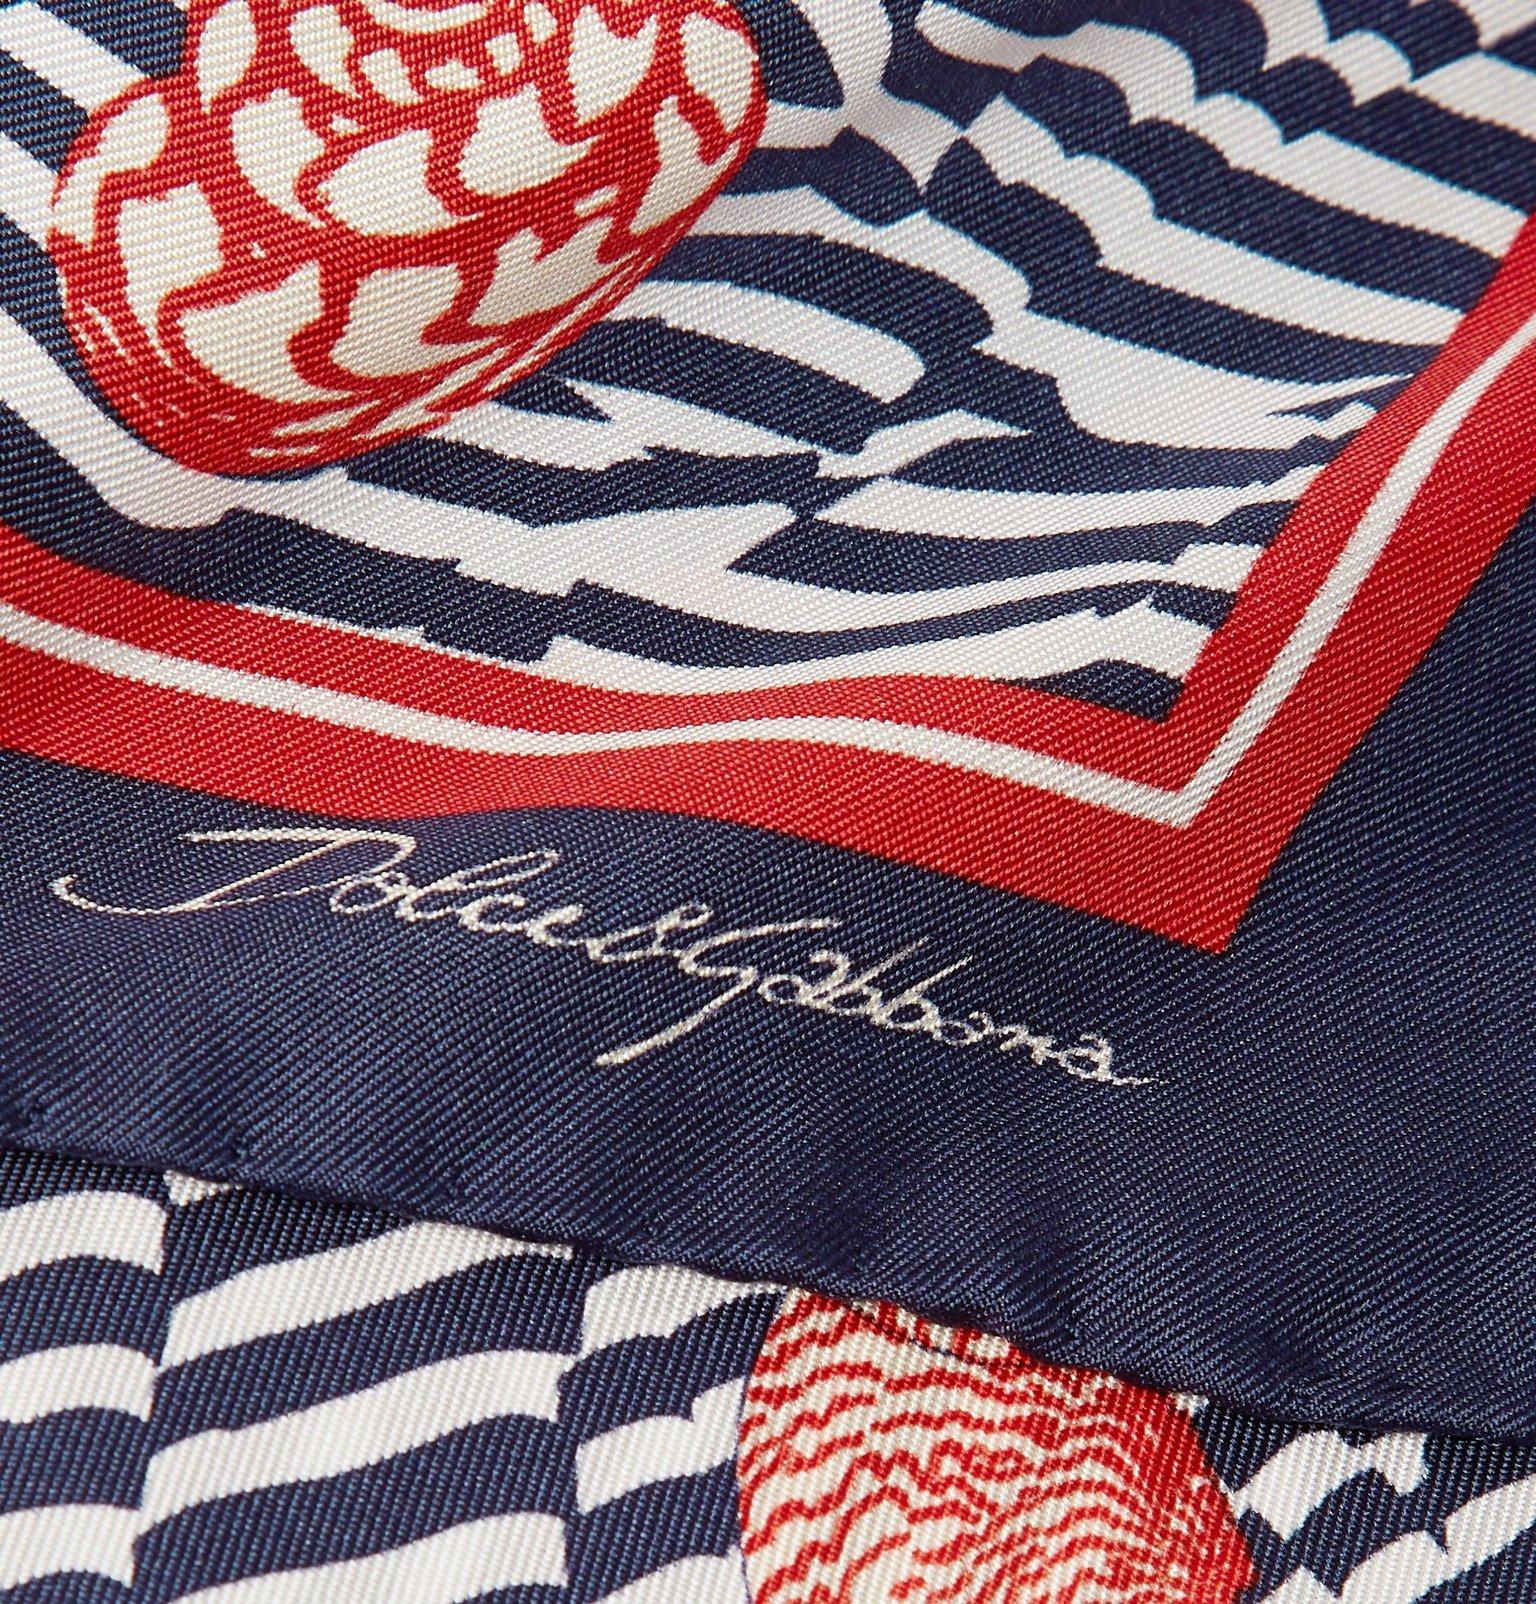 Dolce & Gabbana - Printed Silk-Twill Pocket Square - Blue